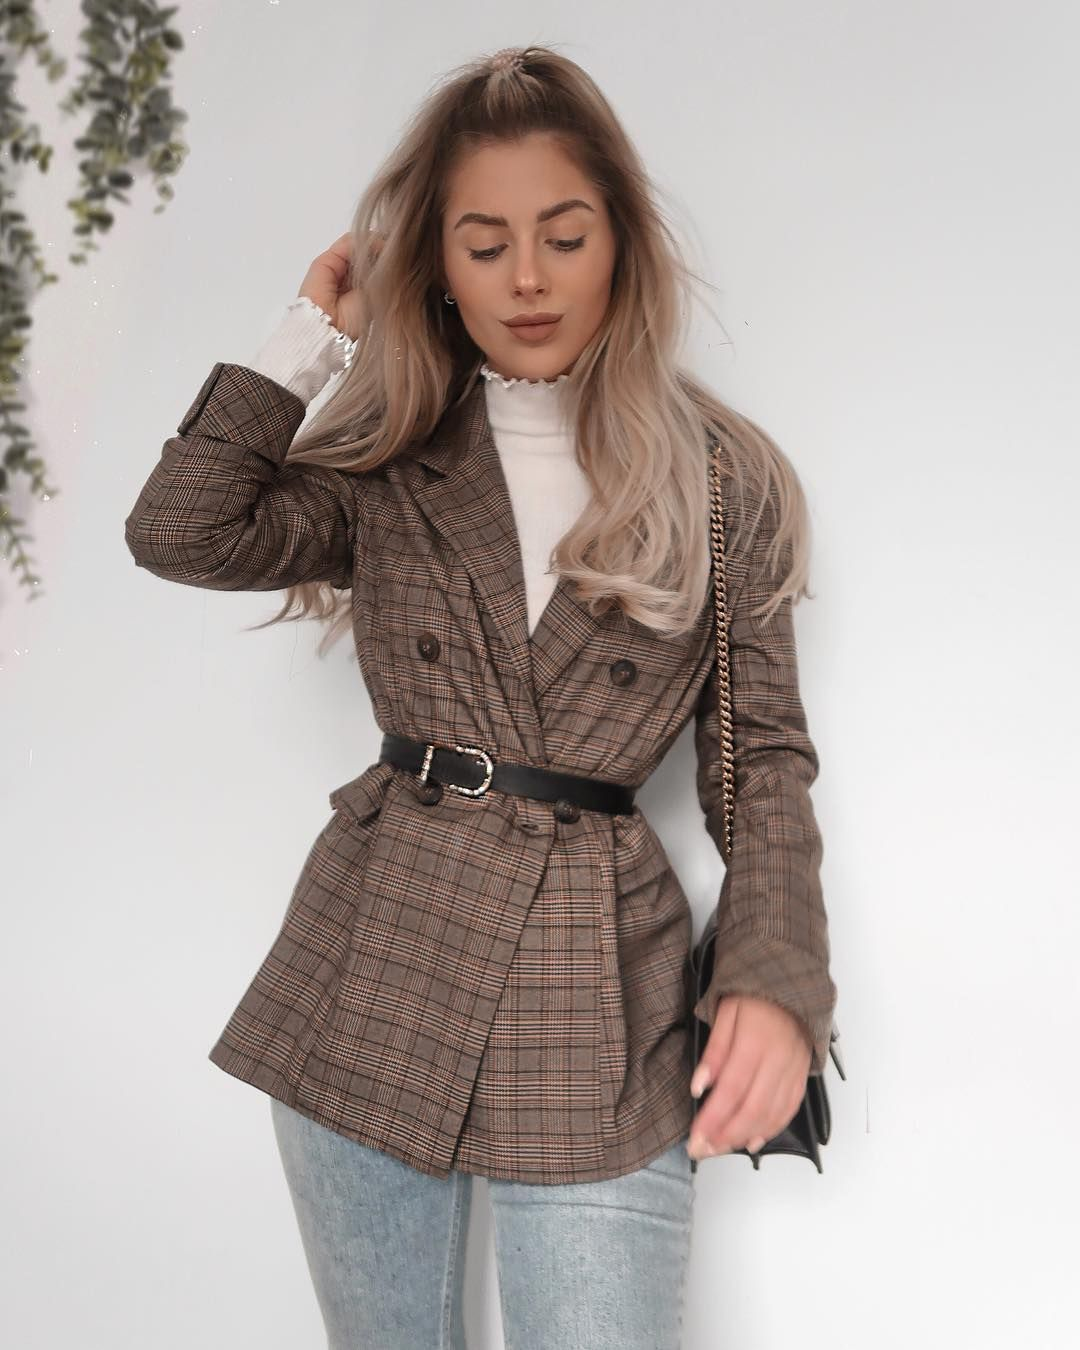 @fashioninflux